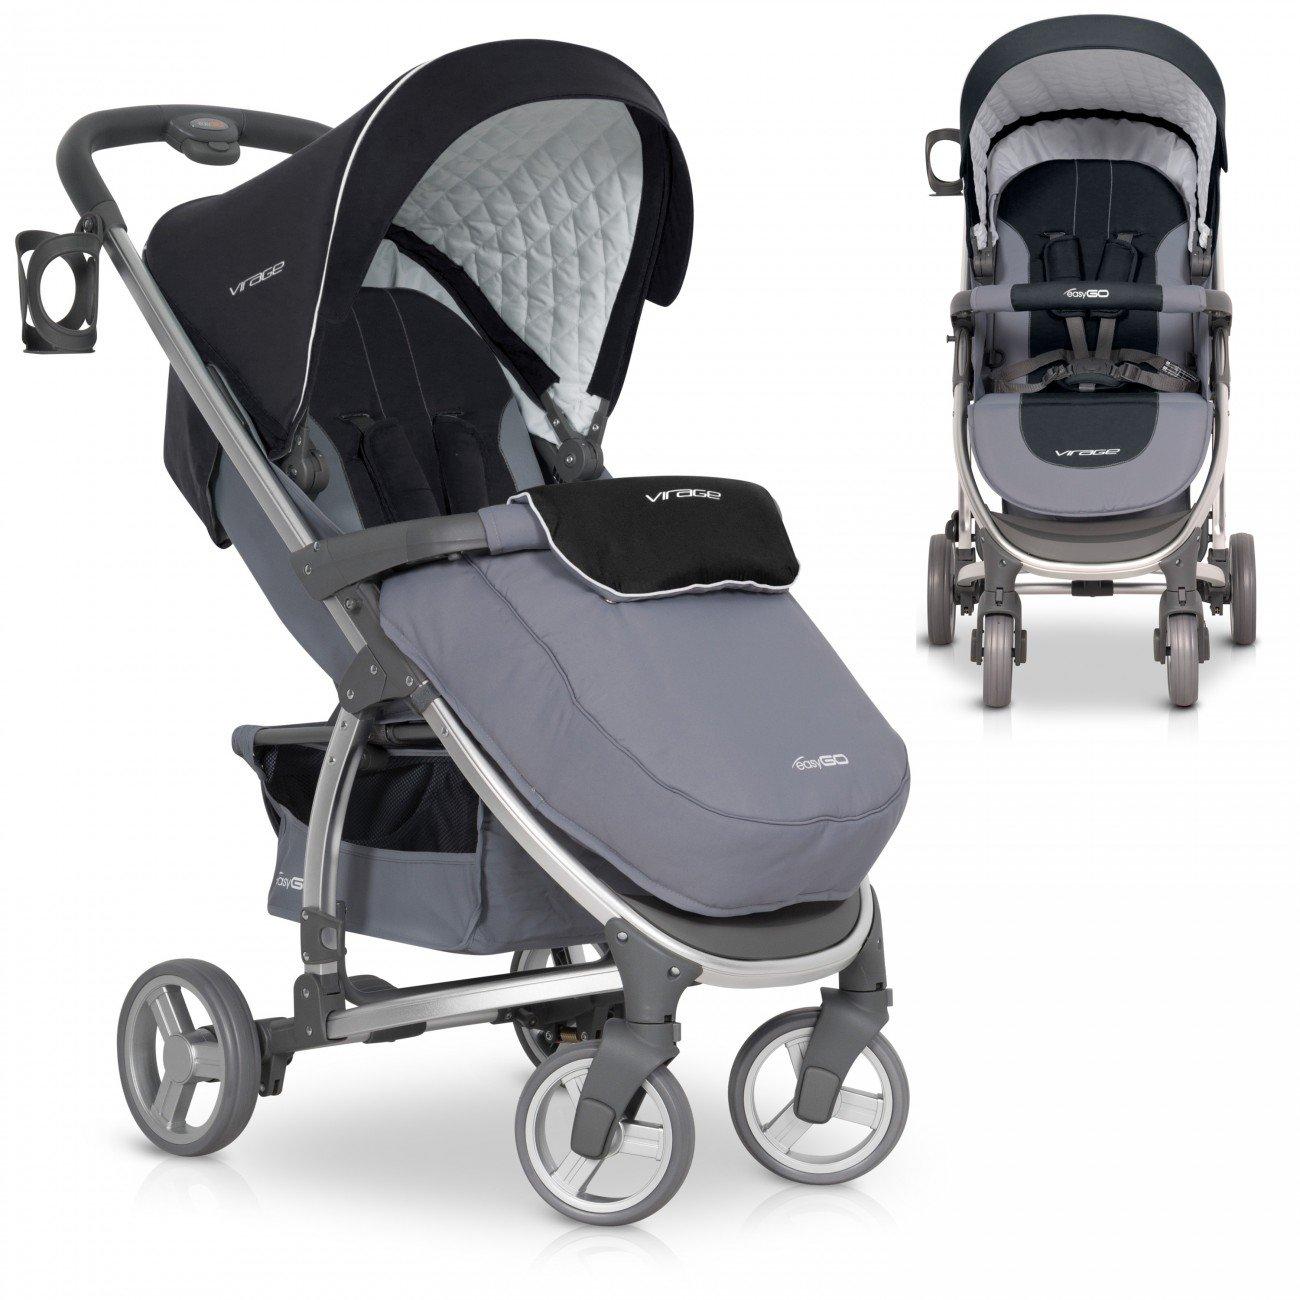 Silla de paseo VIRAGE Carrito con Capazo de alta calidad, color Carbon product image